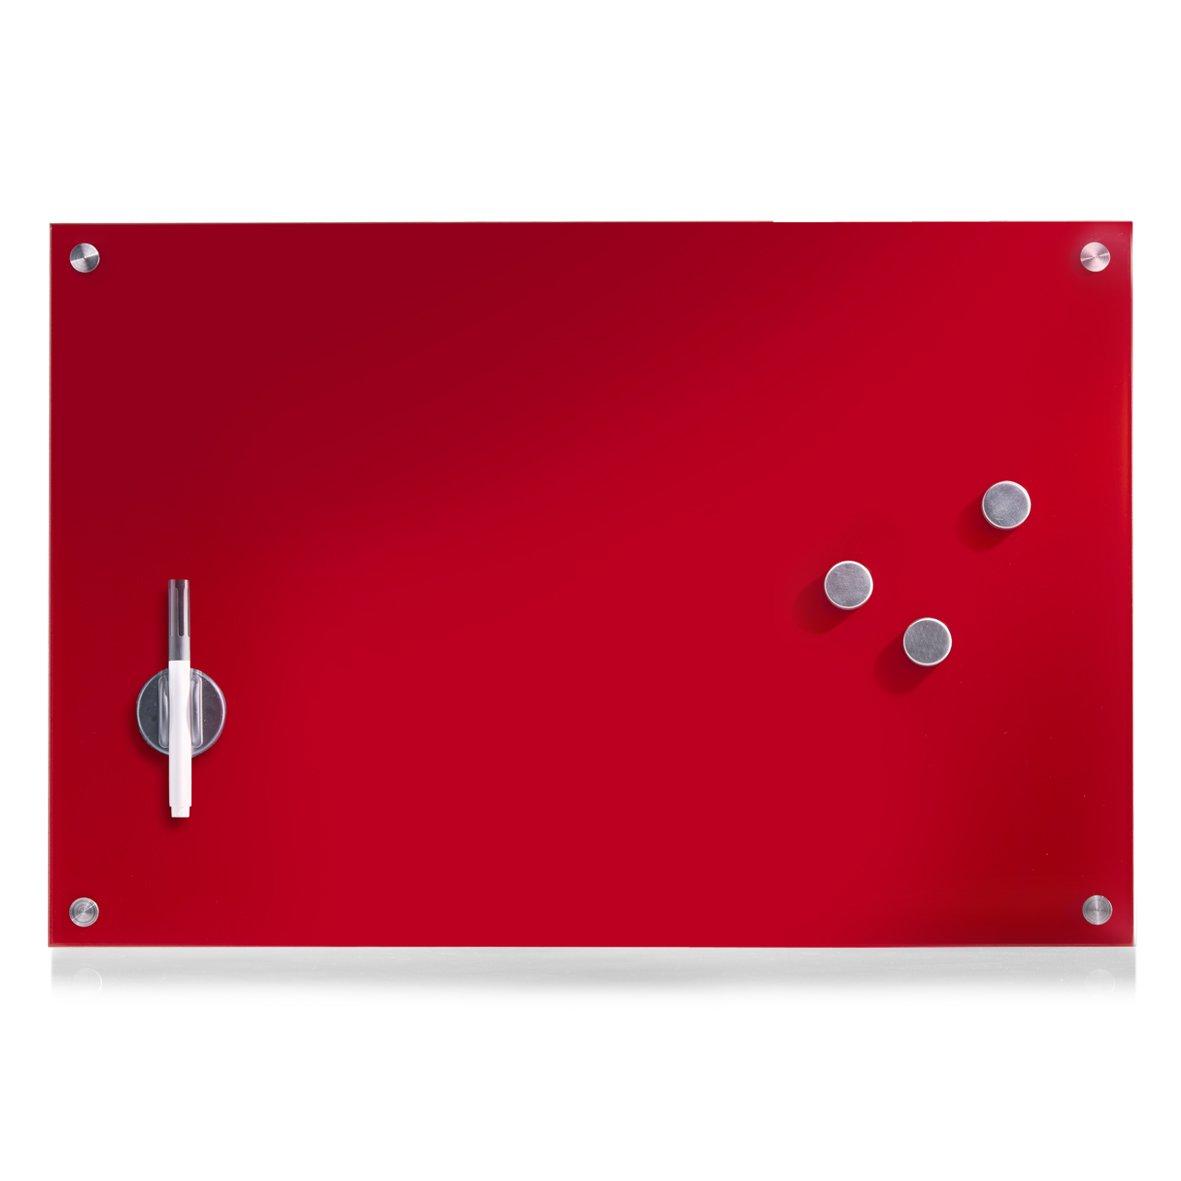 Zeller 60 x 40 cm Memo Board, Glass/Red